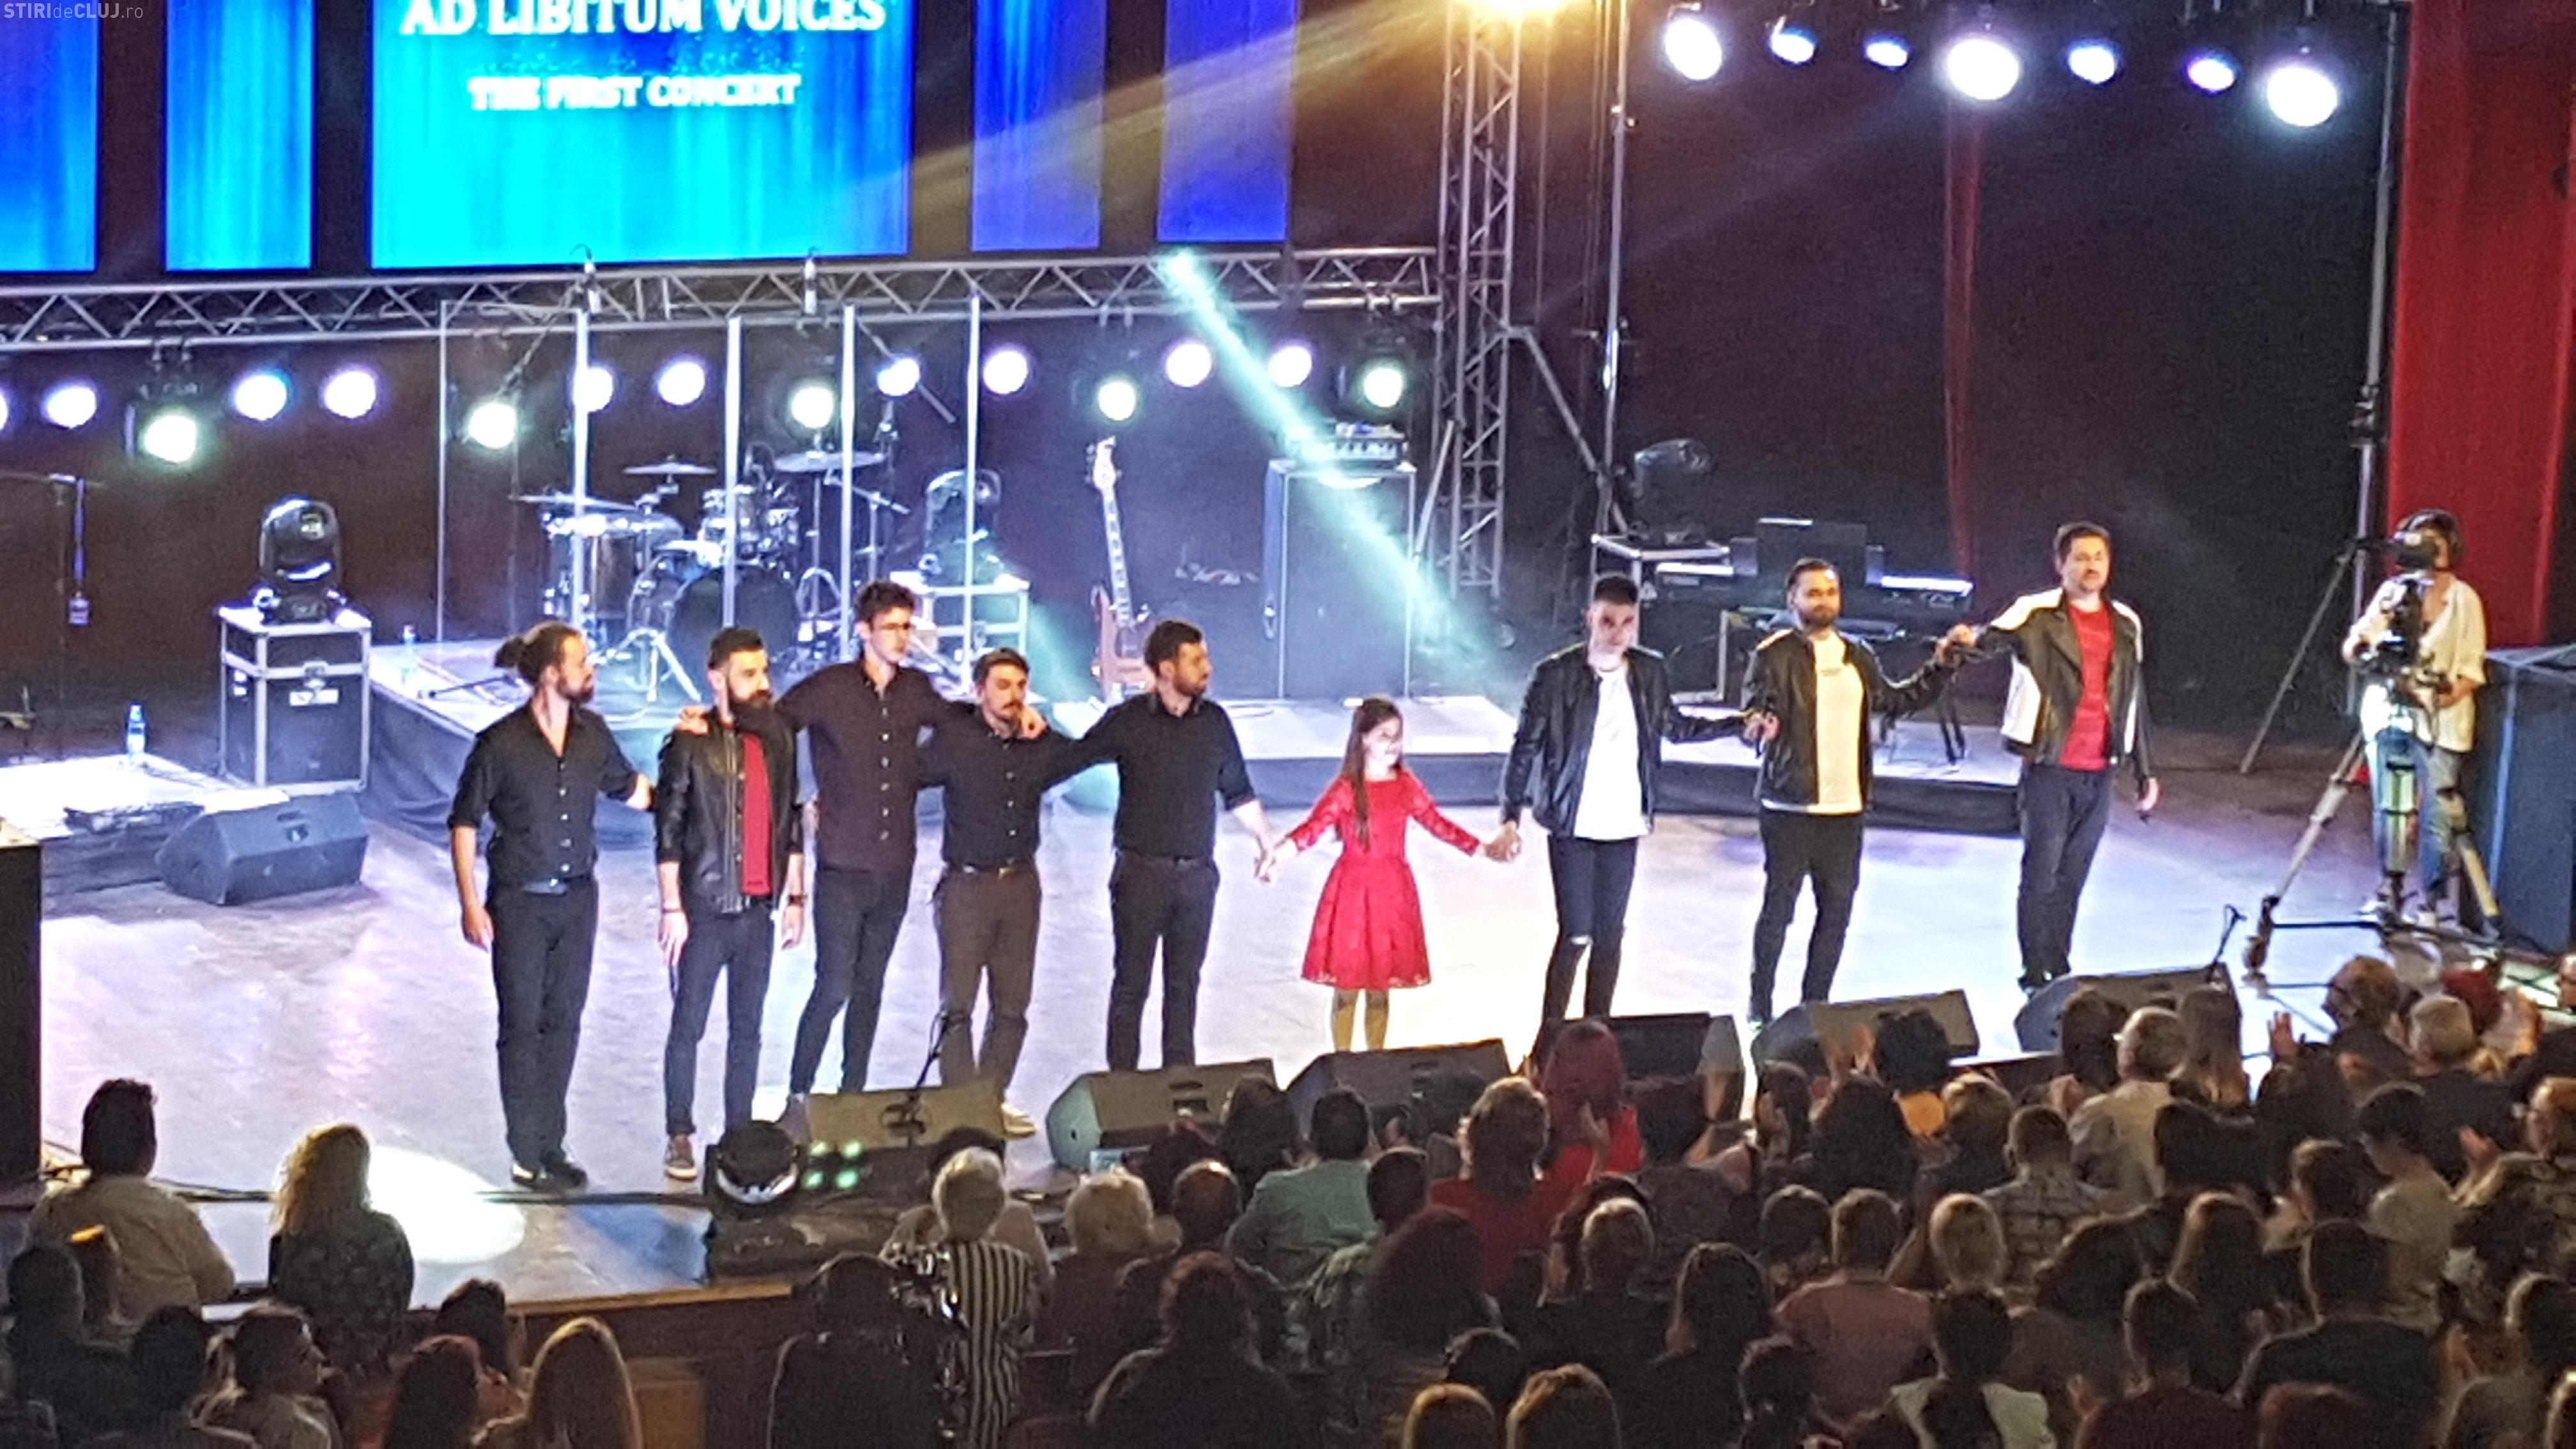 Super SHOW la concertul Ad Libitum de la Cluj. Micuța compozitoare Katia a fost invitat special  - VIDEO și FOTO